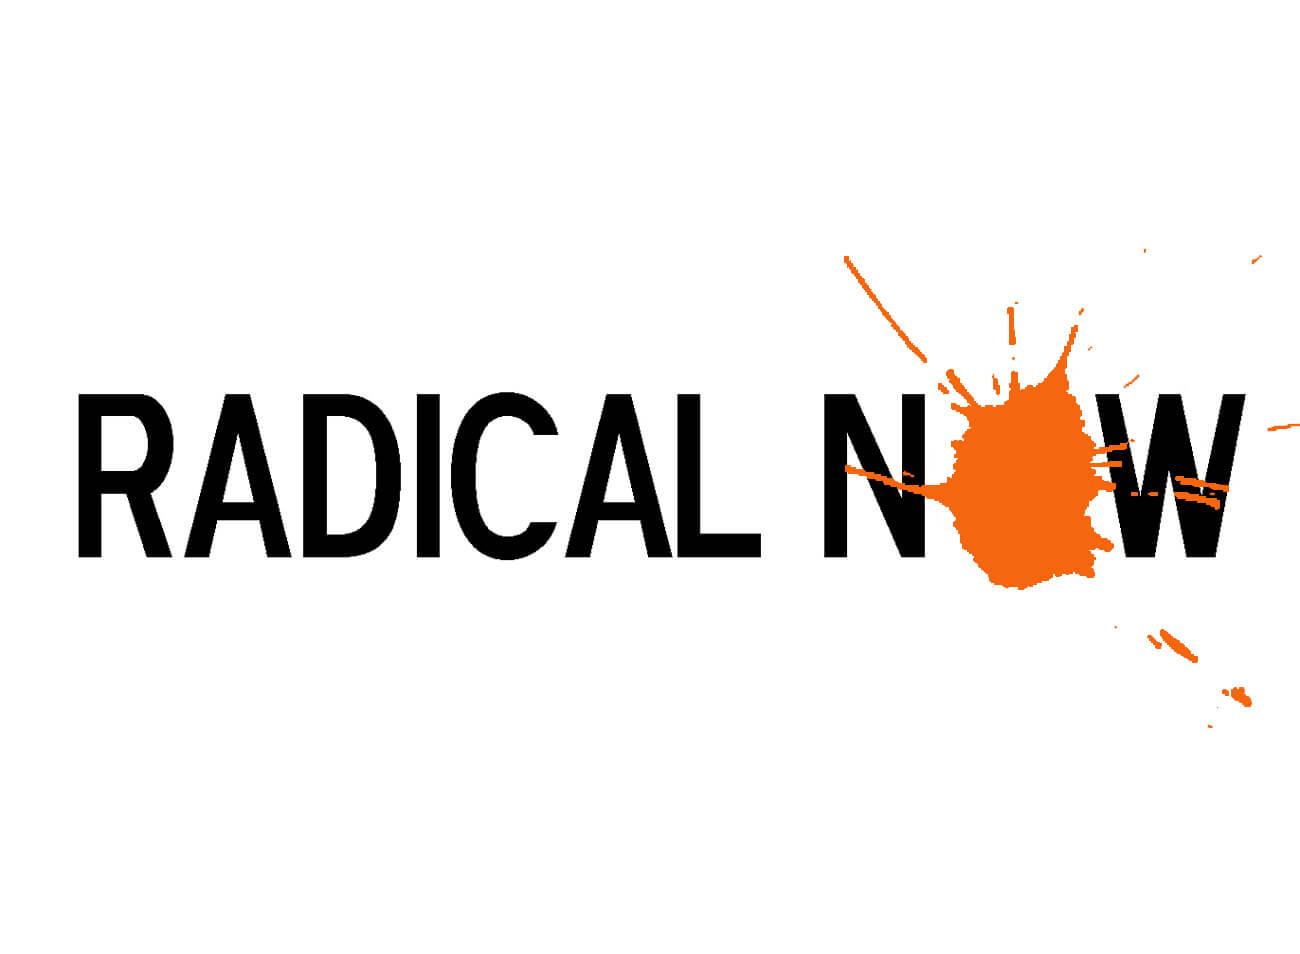 Radical Now